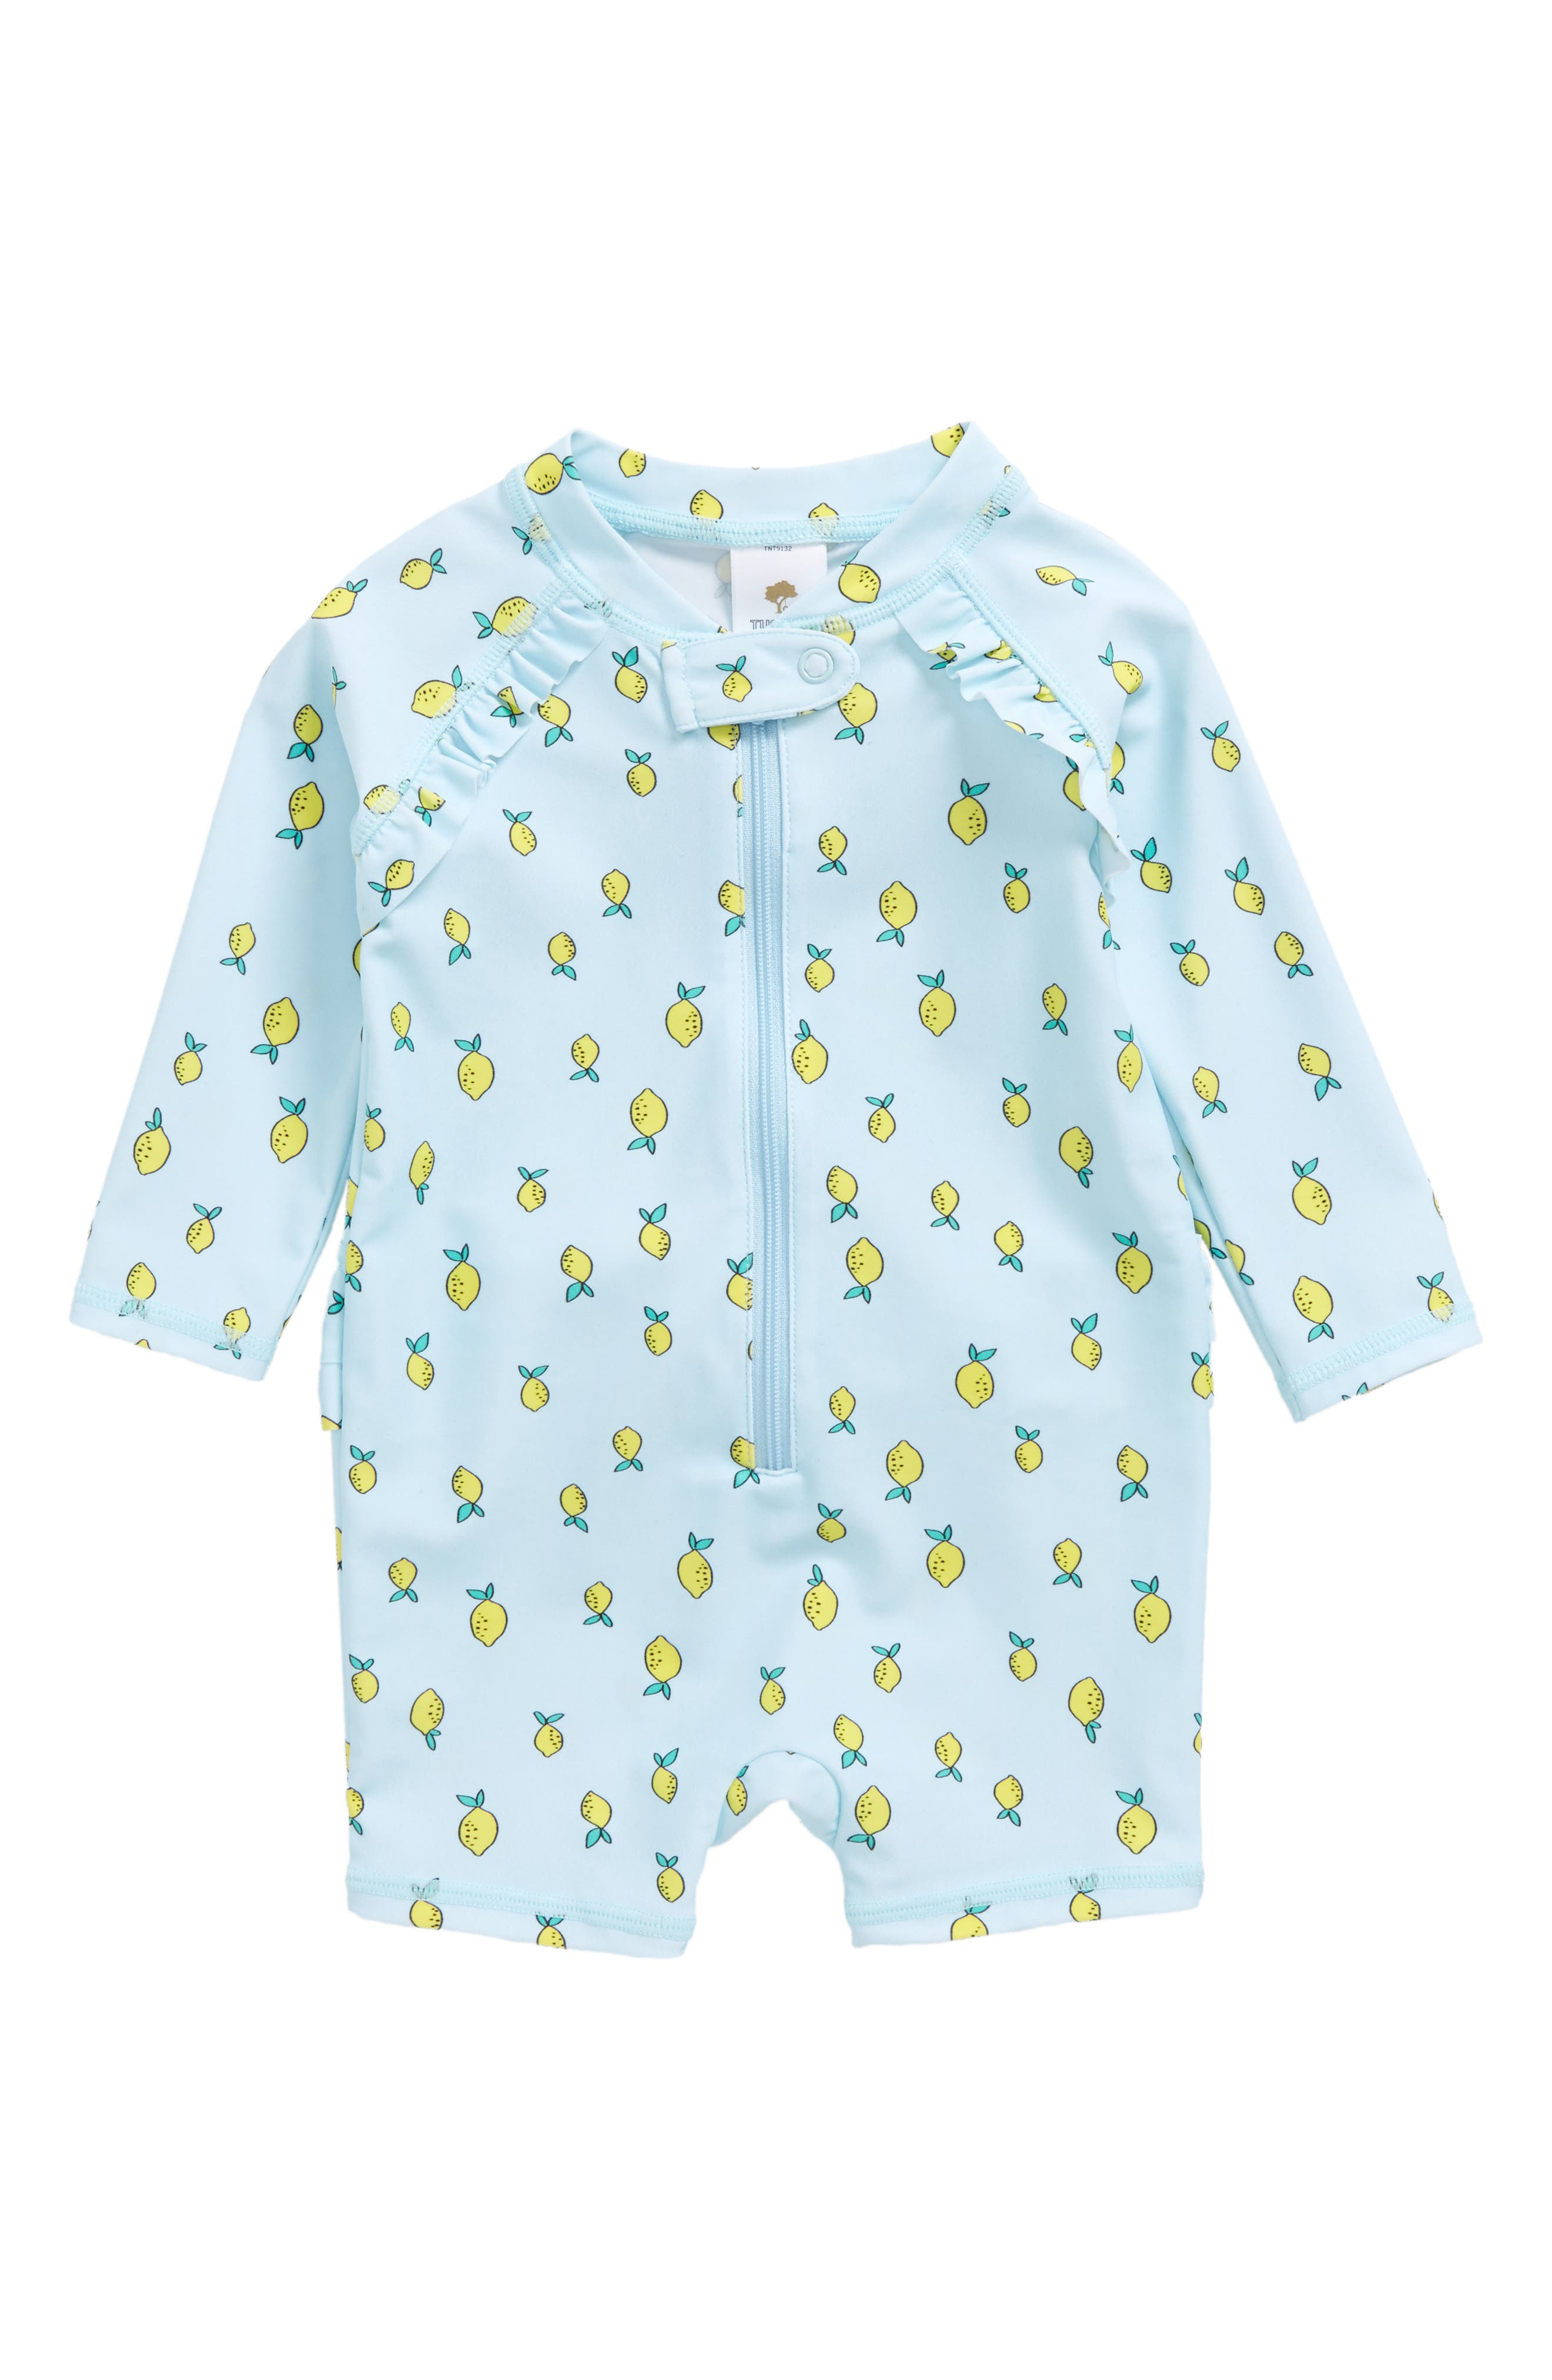 Tucker + Tate Lemon Print One-Piece Rashguard Swimsuit (Baby Girls)